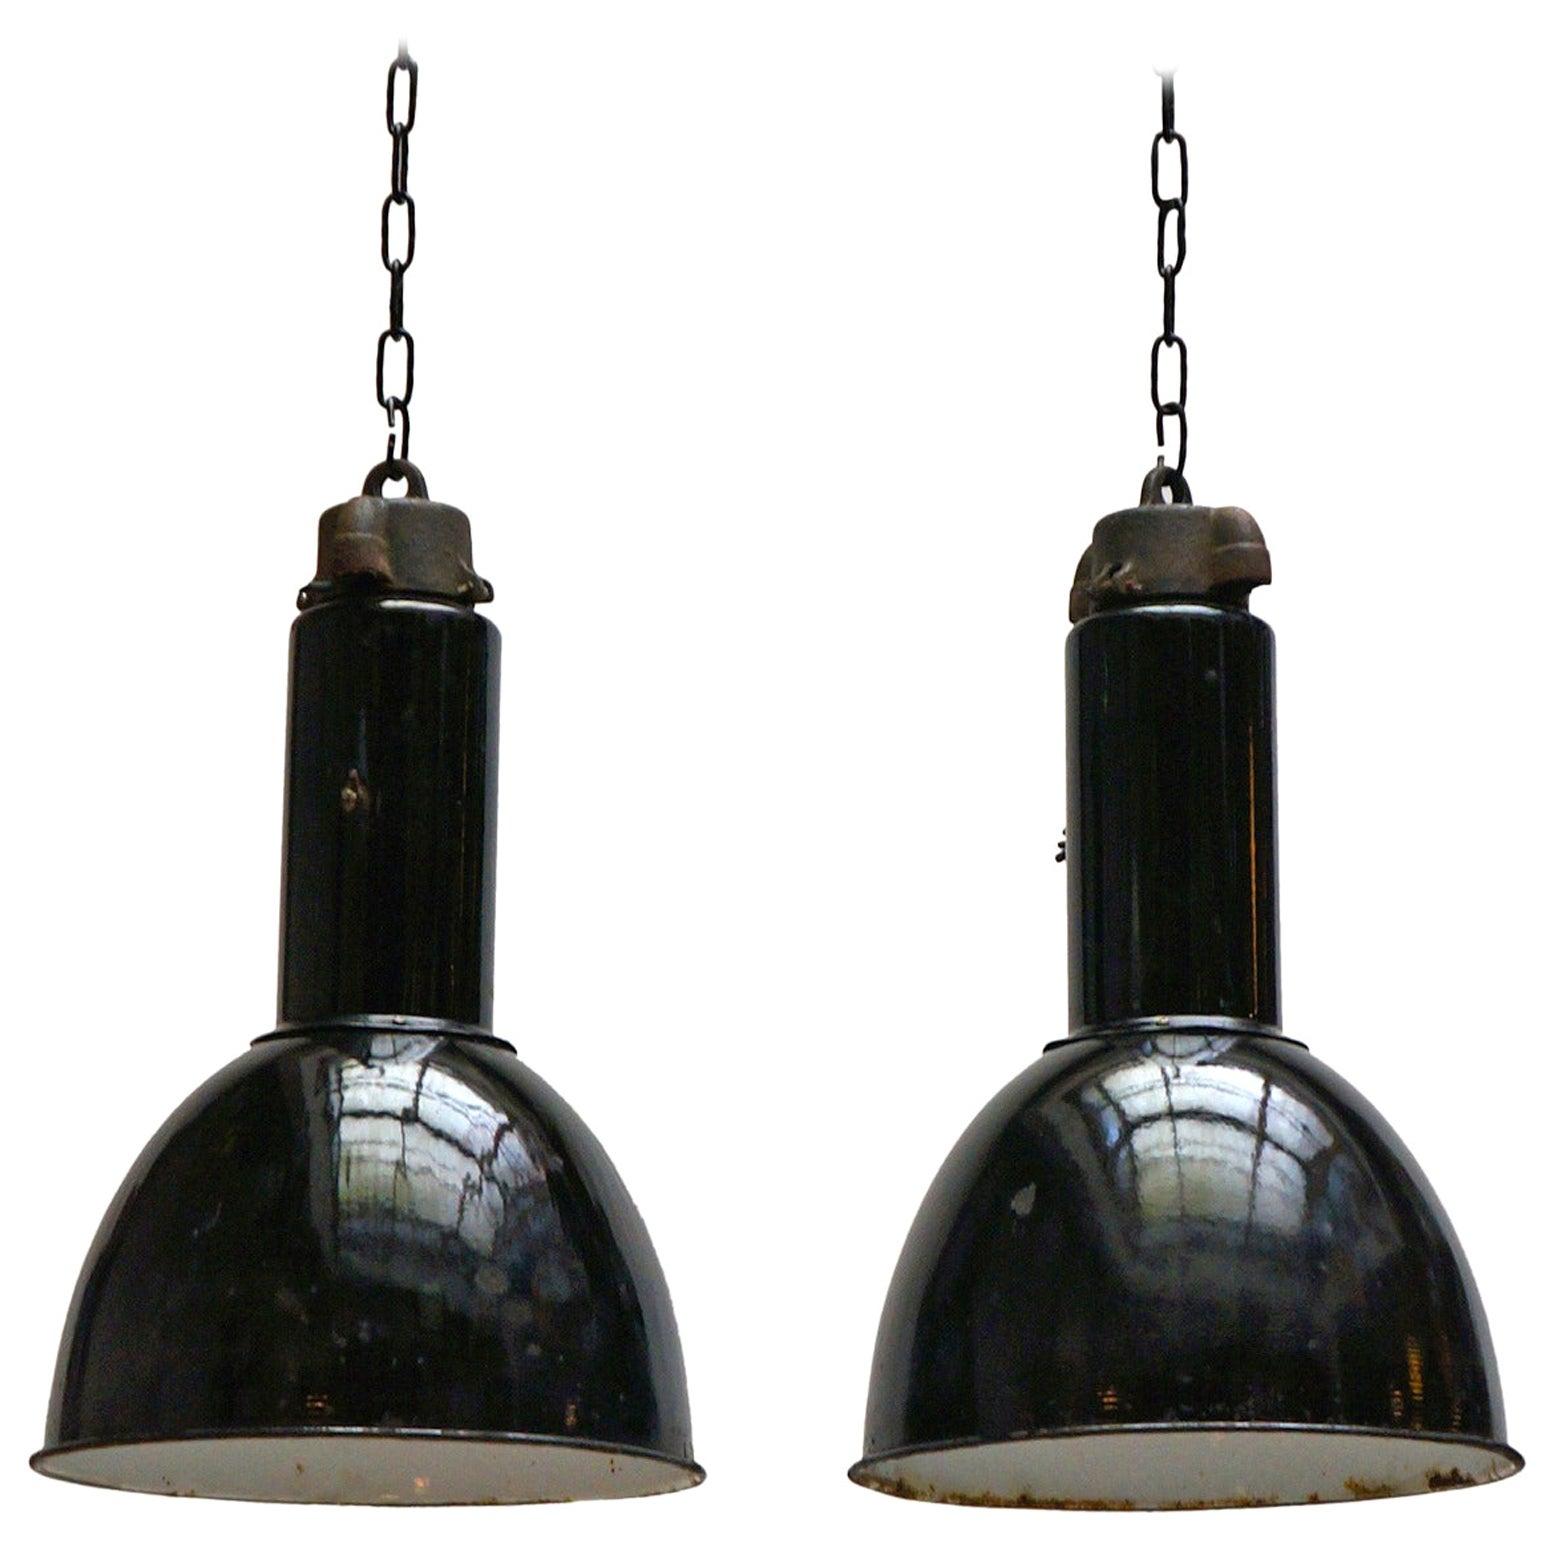 Enamel Industrial Factory Pendant Lights